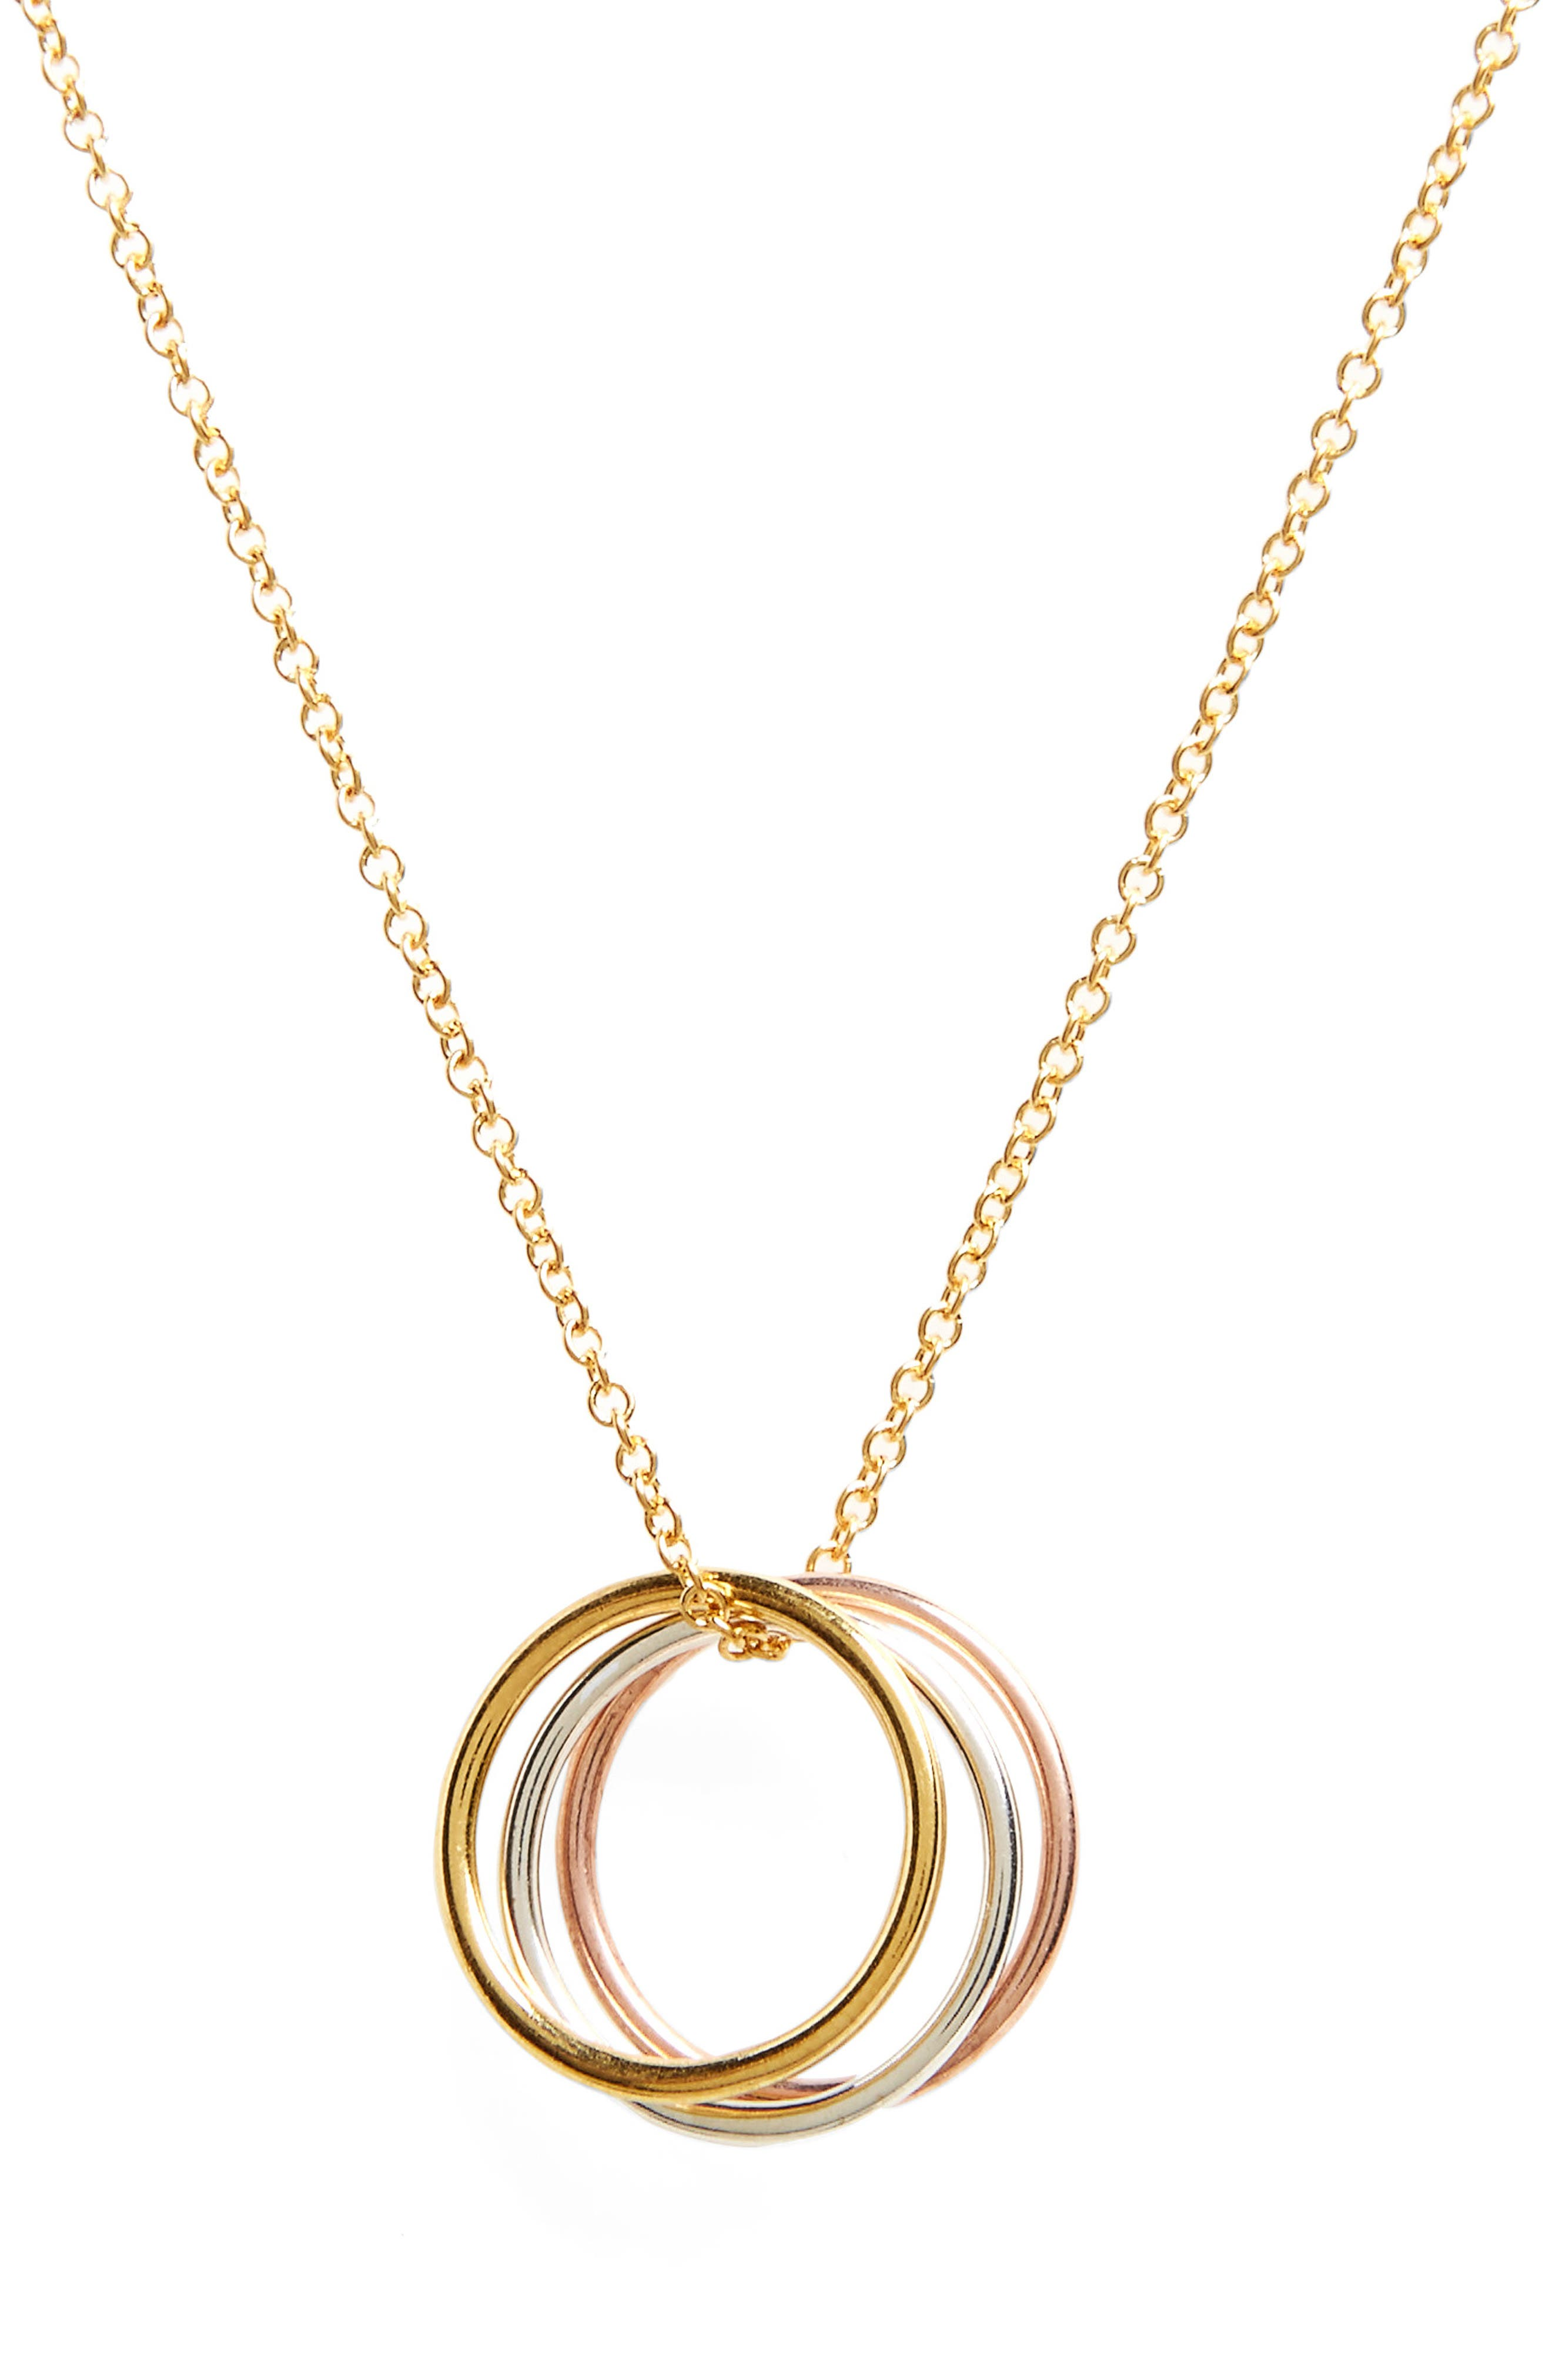 Triple Karma Pendant Necklace,                             Main thumbnail 1, color,                             711